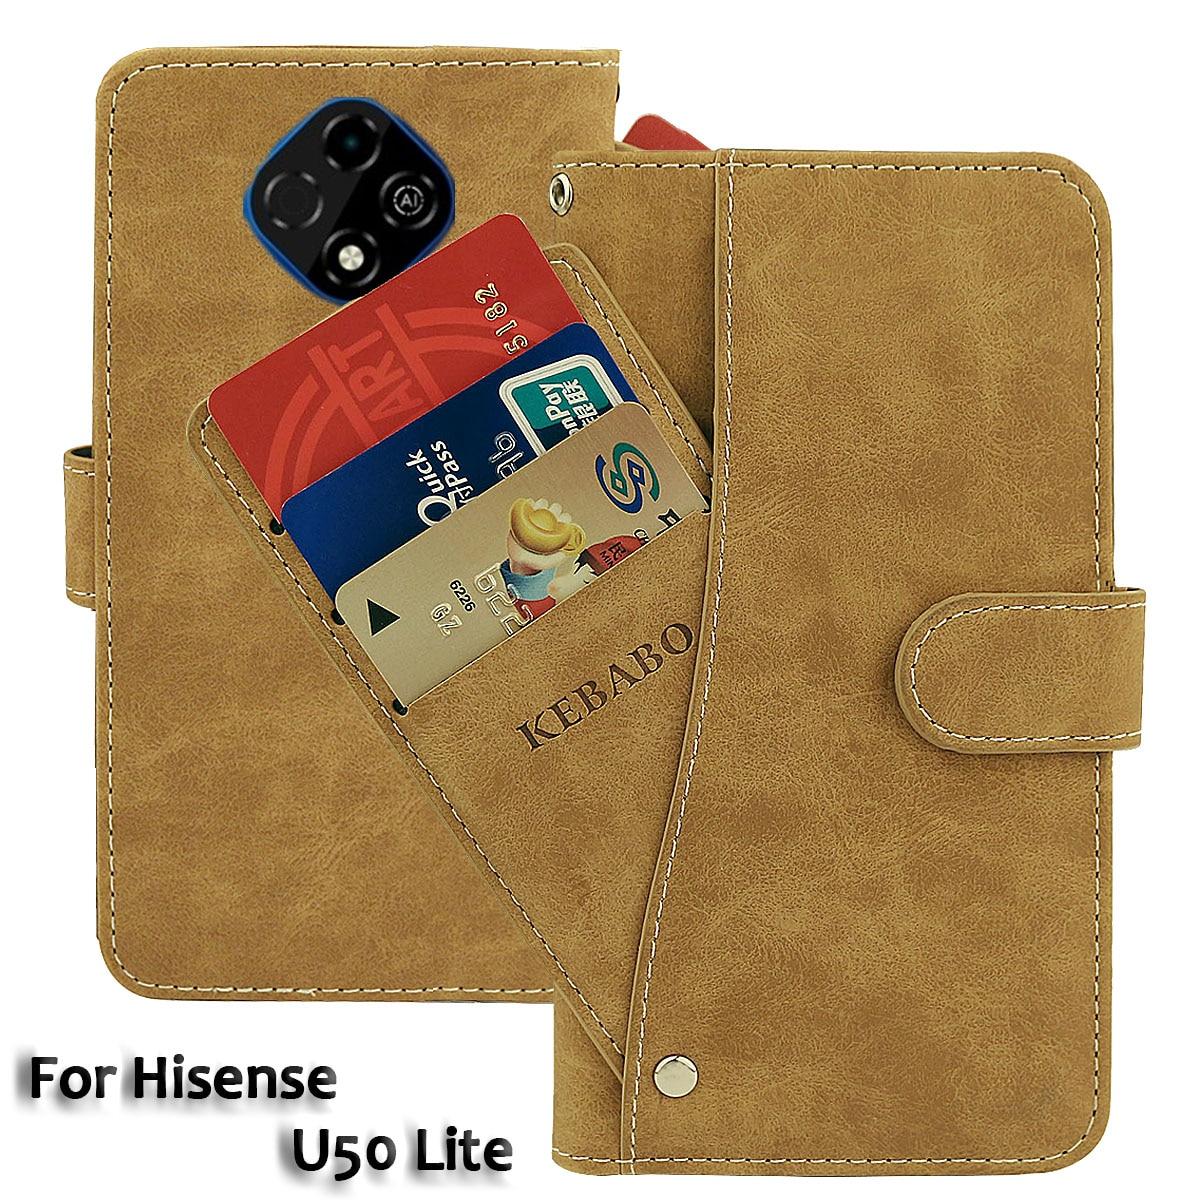 Vintage Leather Wallet Hisense E50 Lite Case 6.52